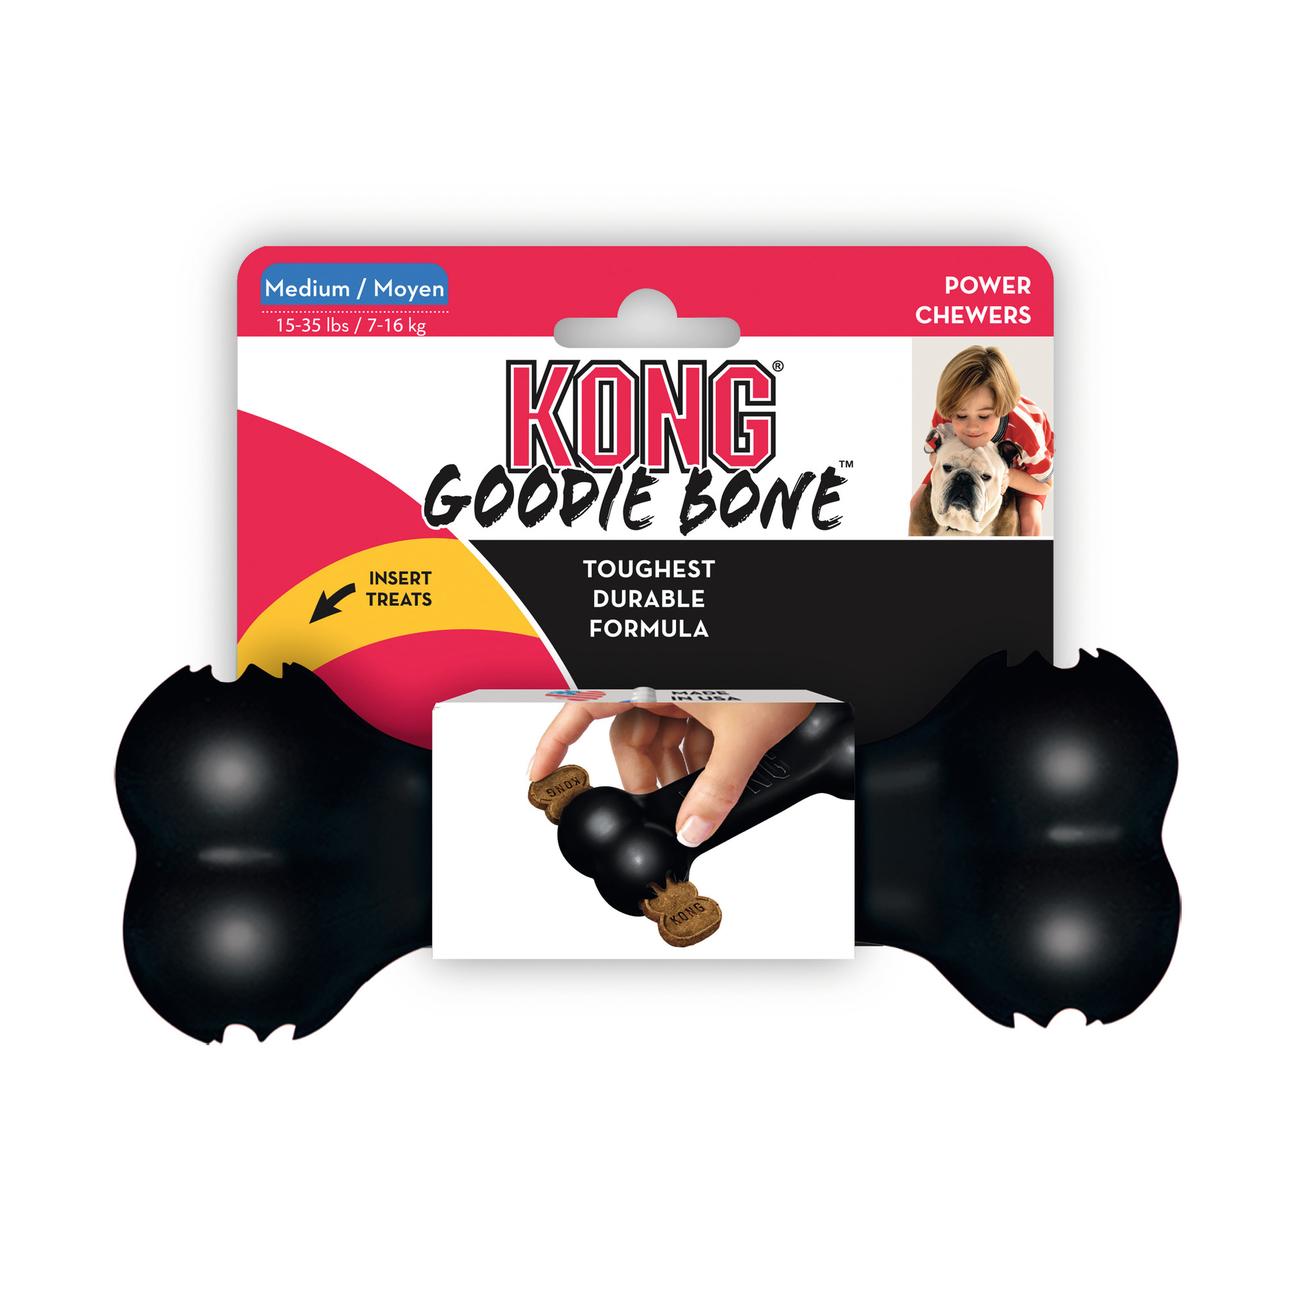 KONG Extreme Goodie Bone Hundespielzeug, Bild 2